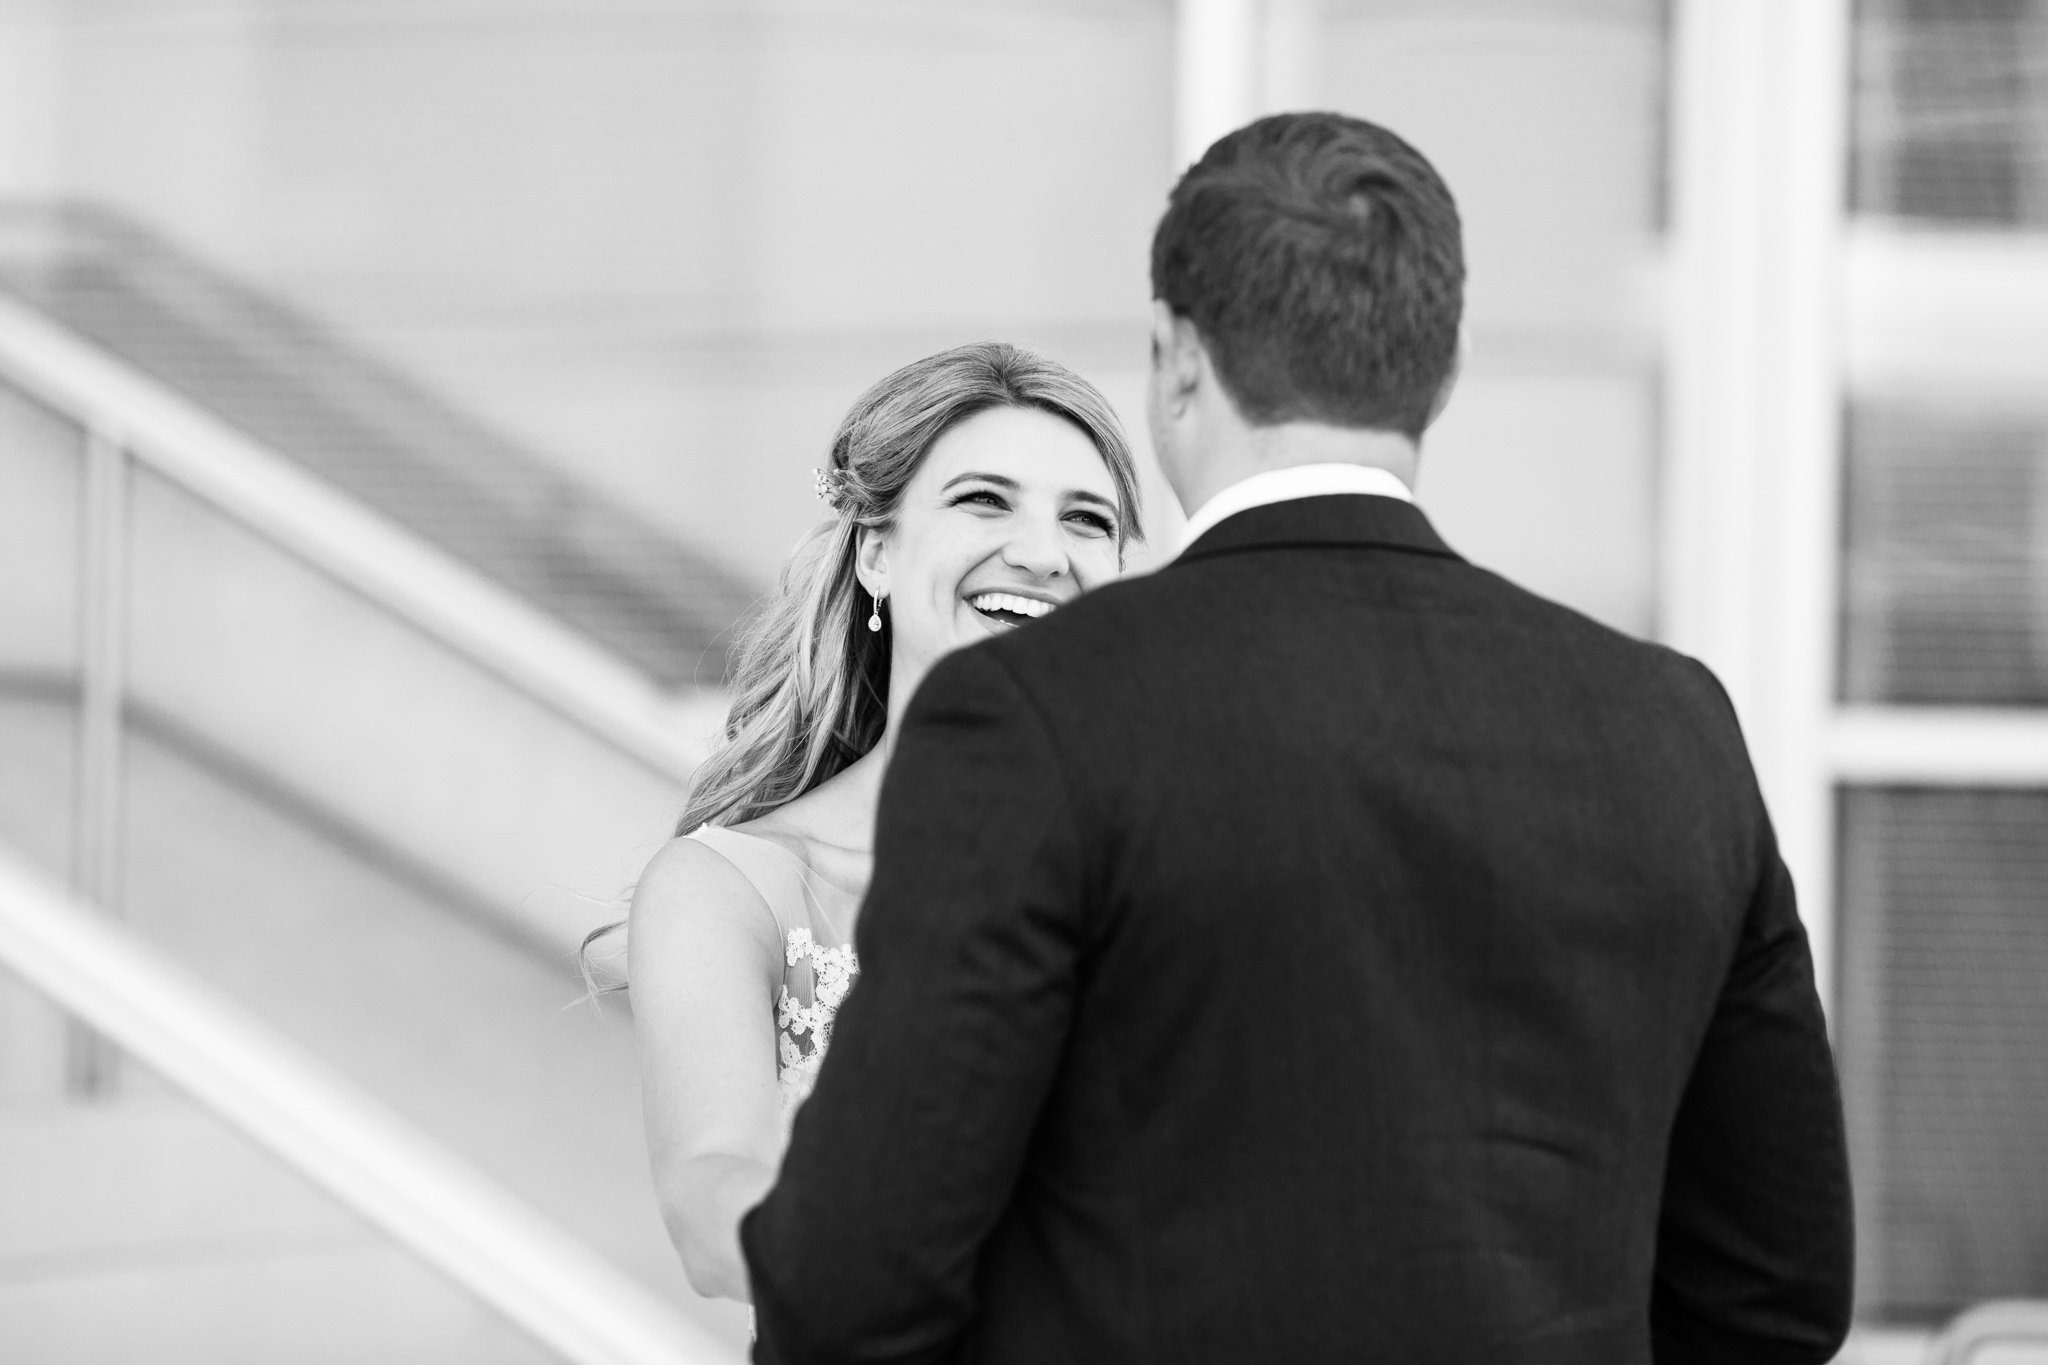 bridgeport-art-center-wedding-photos-6.jpg